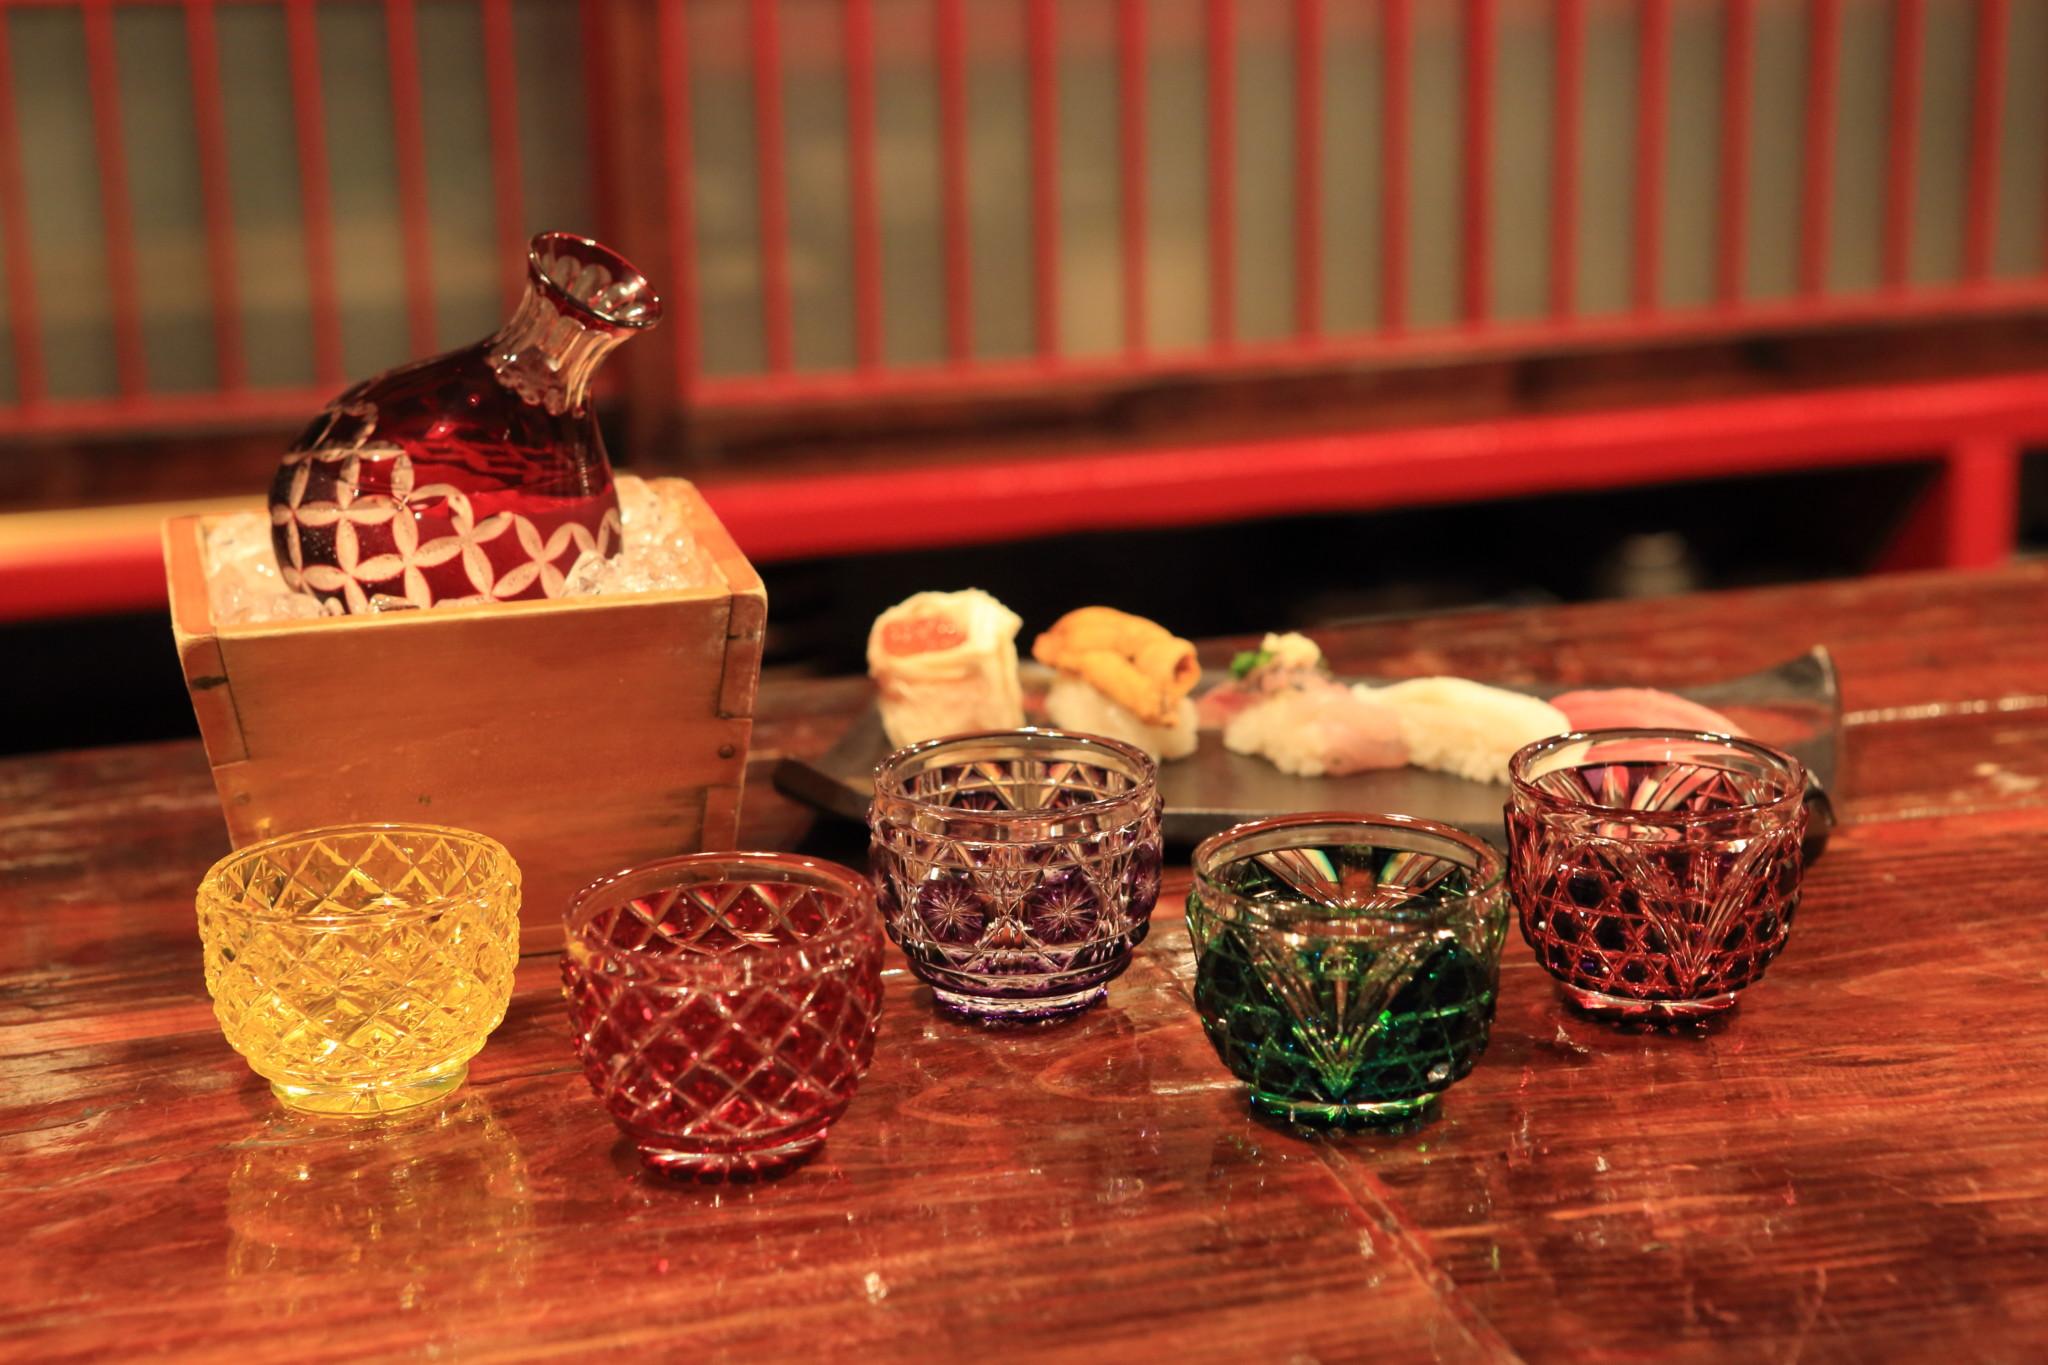 薩摩切子,島津紫,薩摩,紅ガラス,酒器